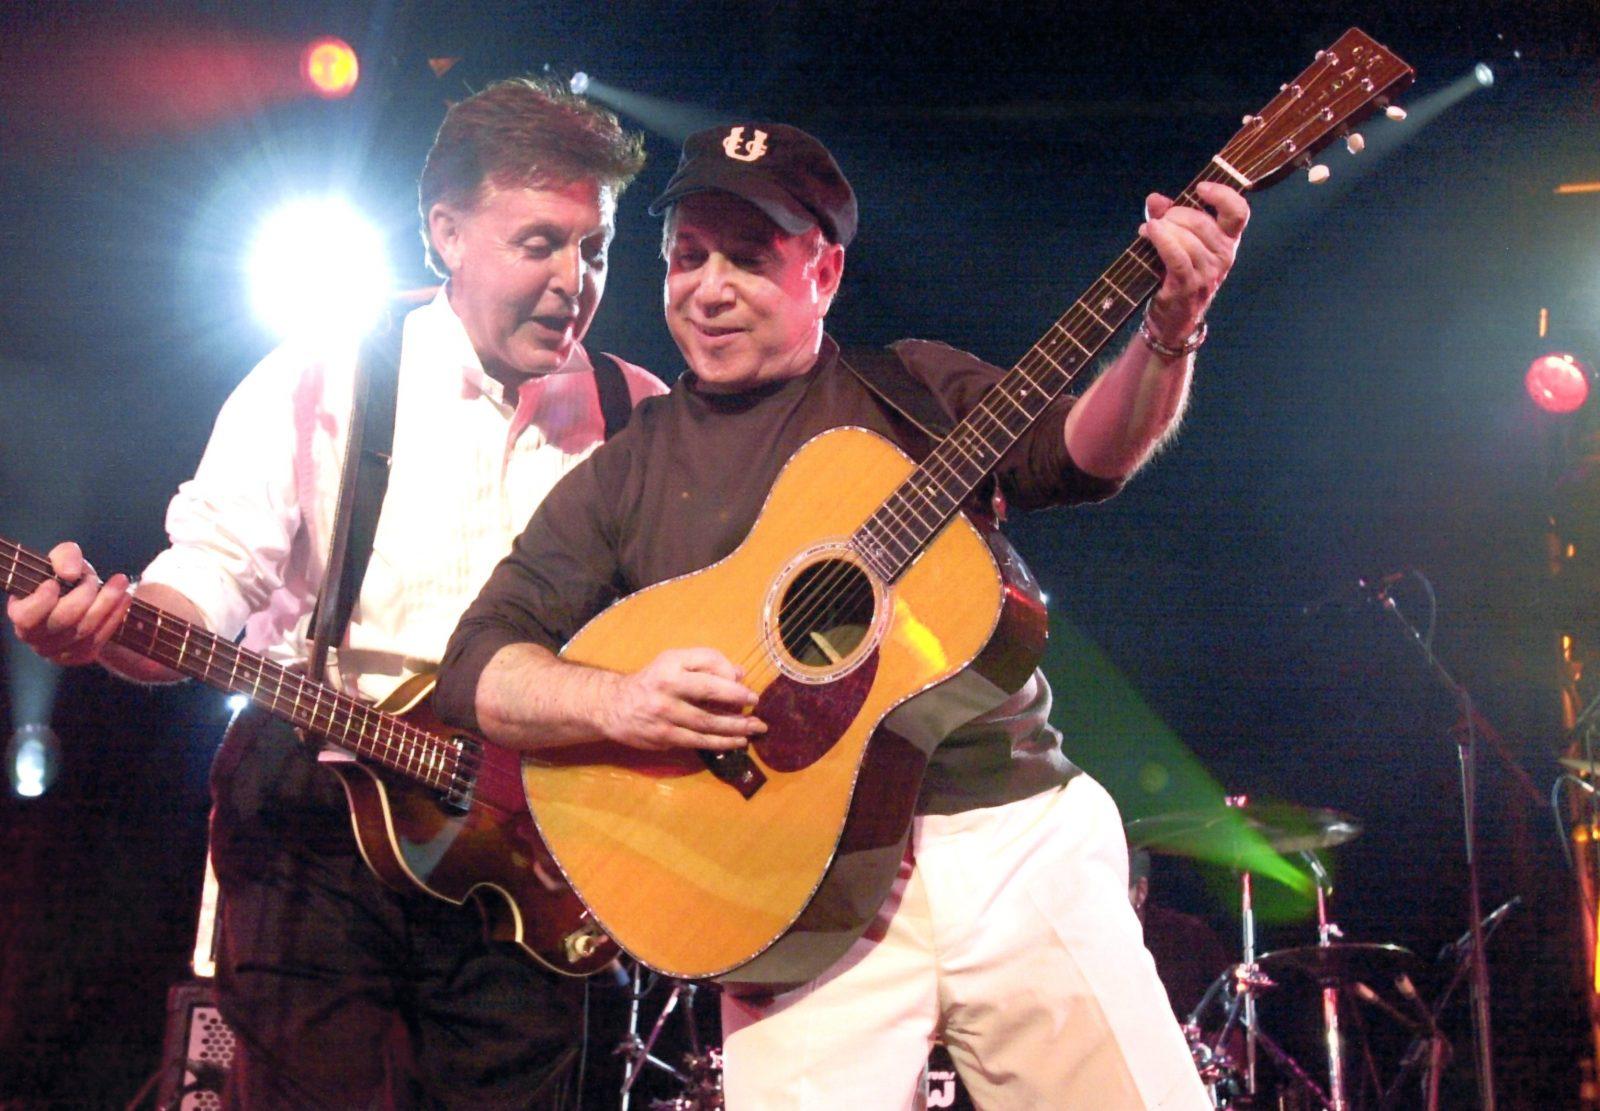 Paul McCartney and Paul Simon